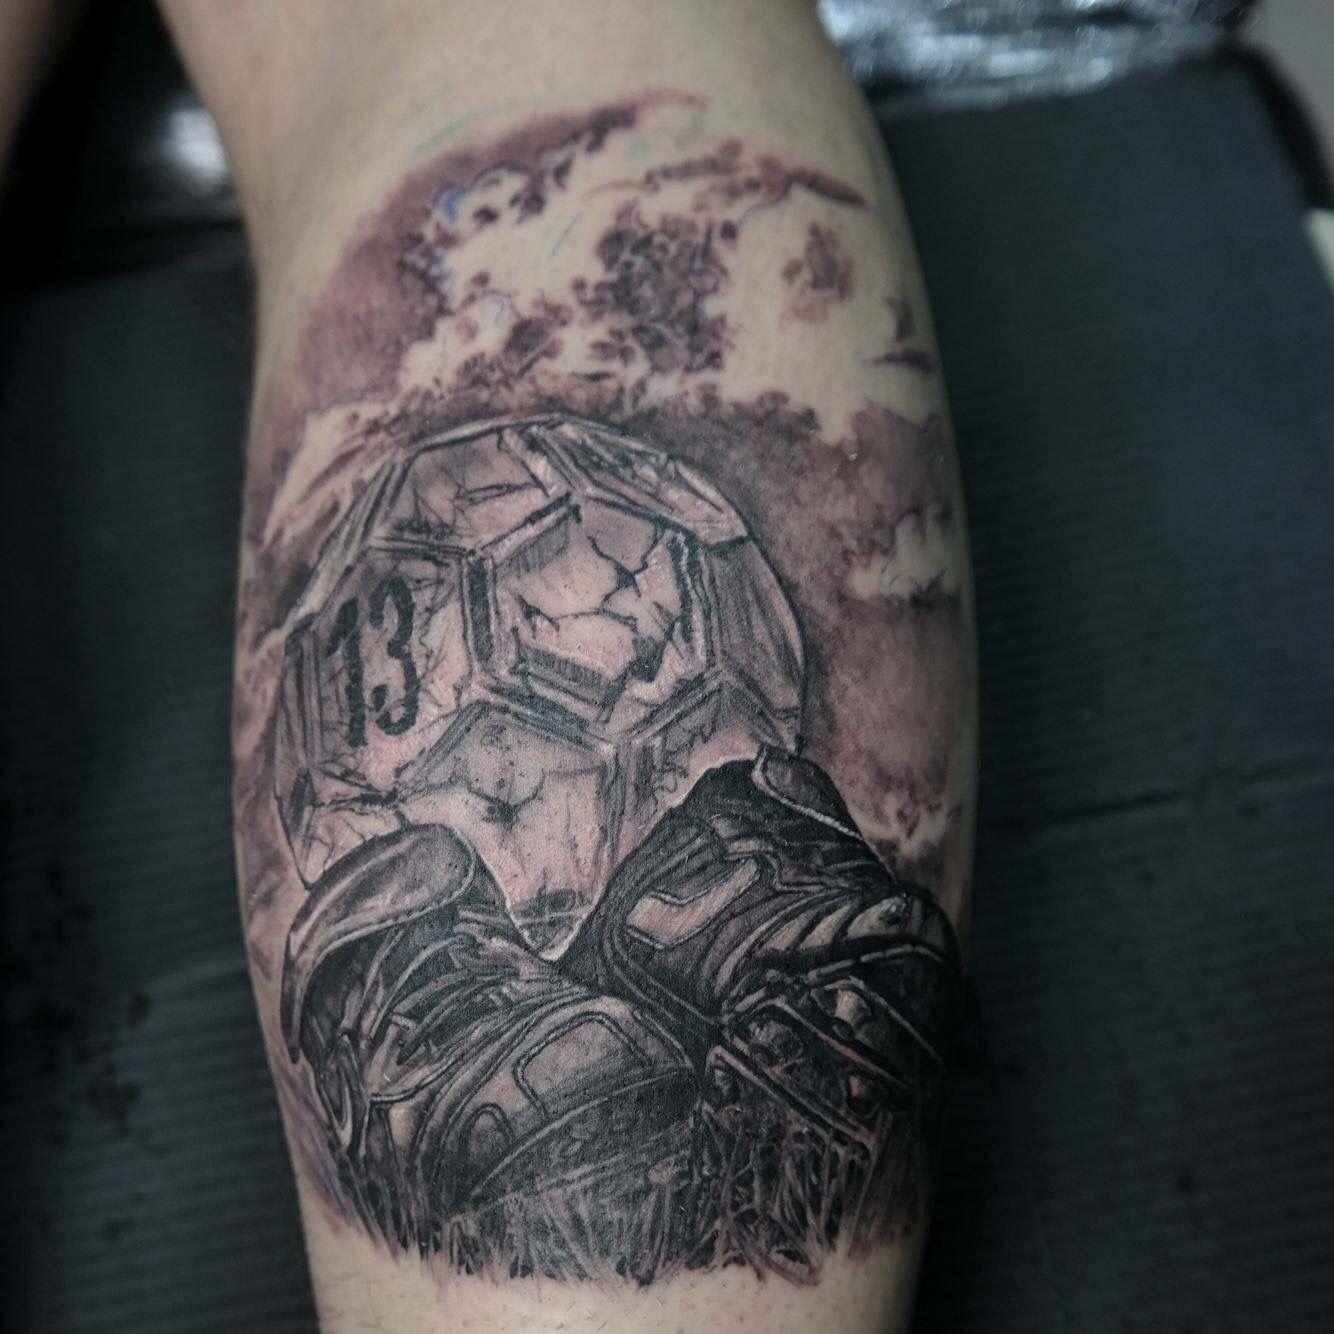 Ansprechend Fussball Tattoo Galerie Von My Football ✌ Schulter Tattoo, Fußball, Ideen,